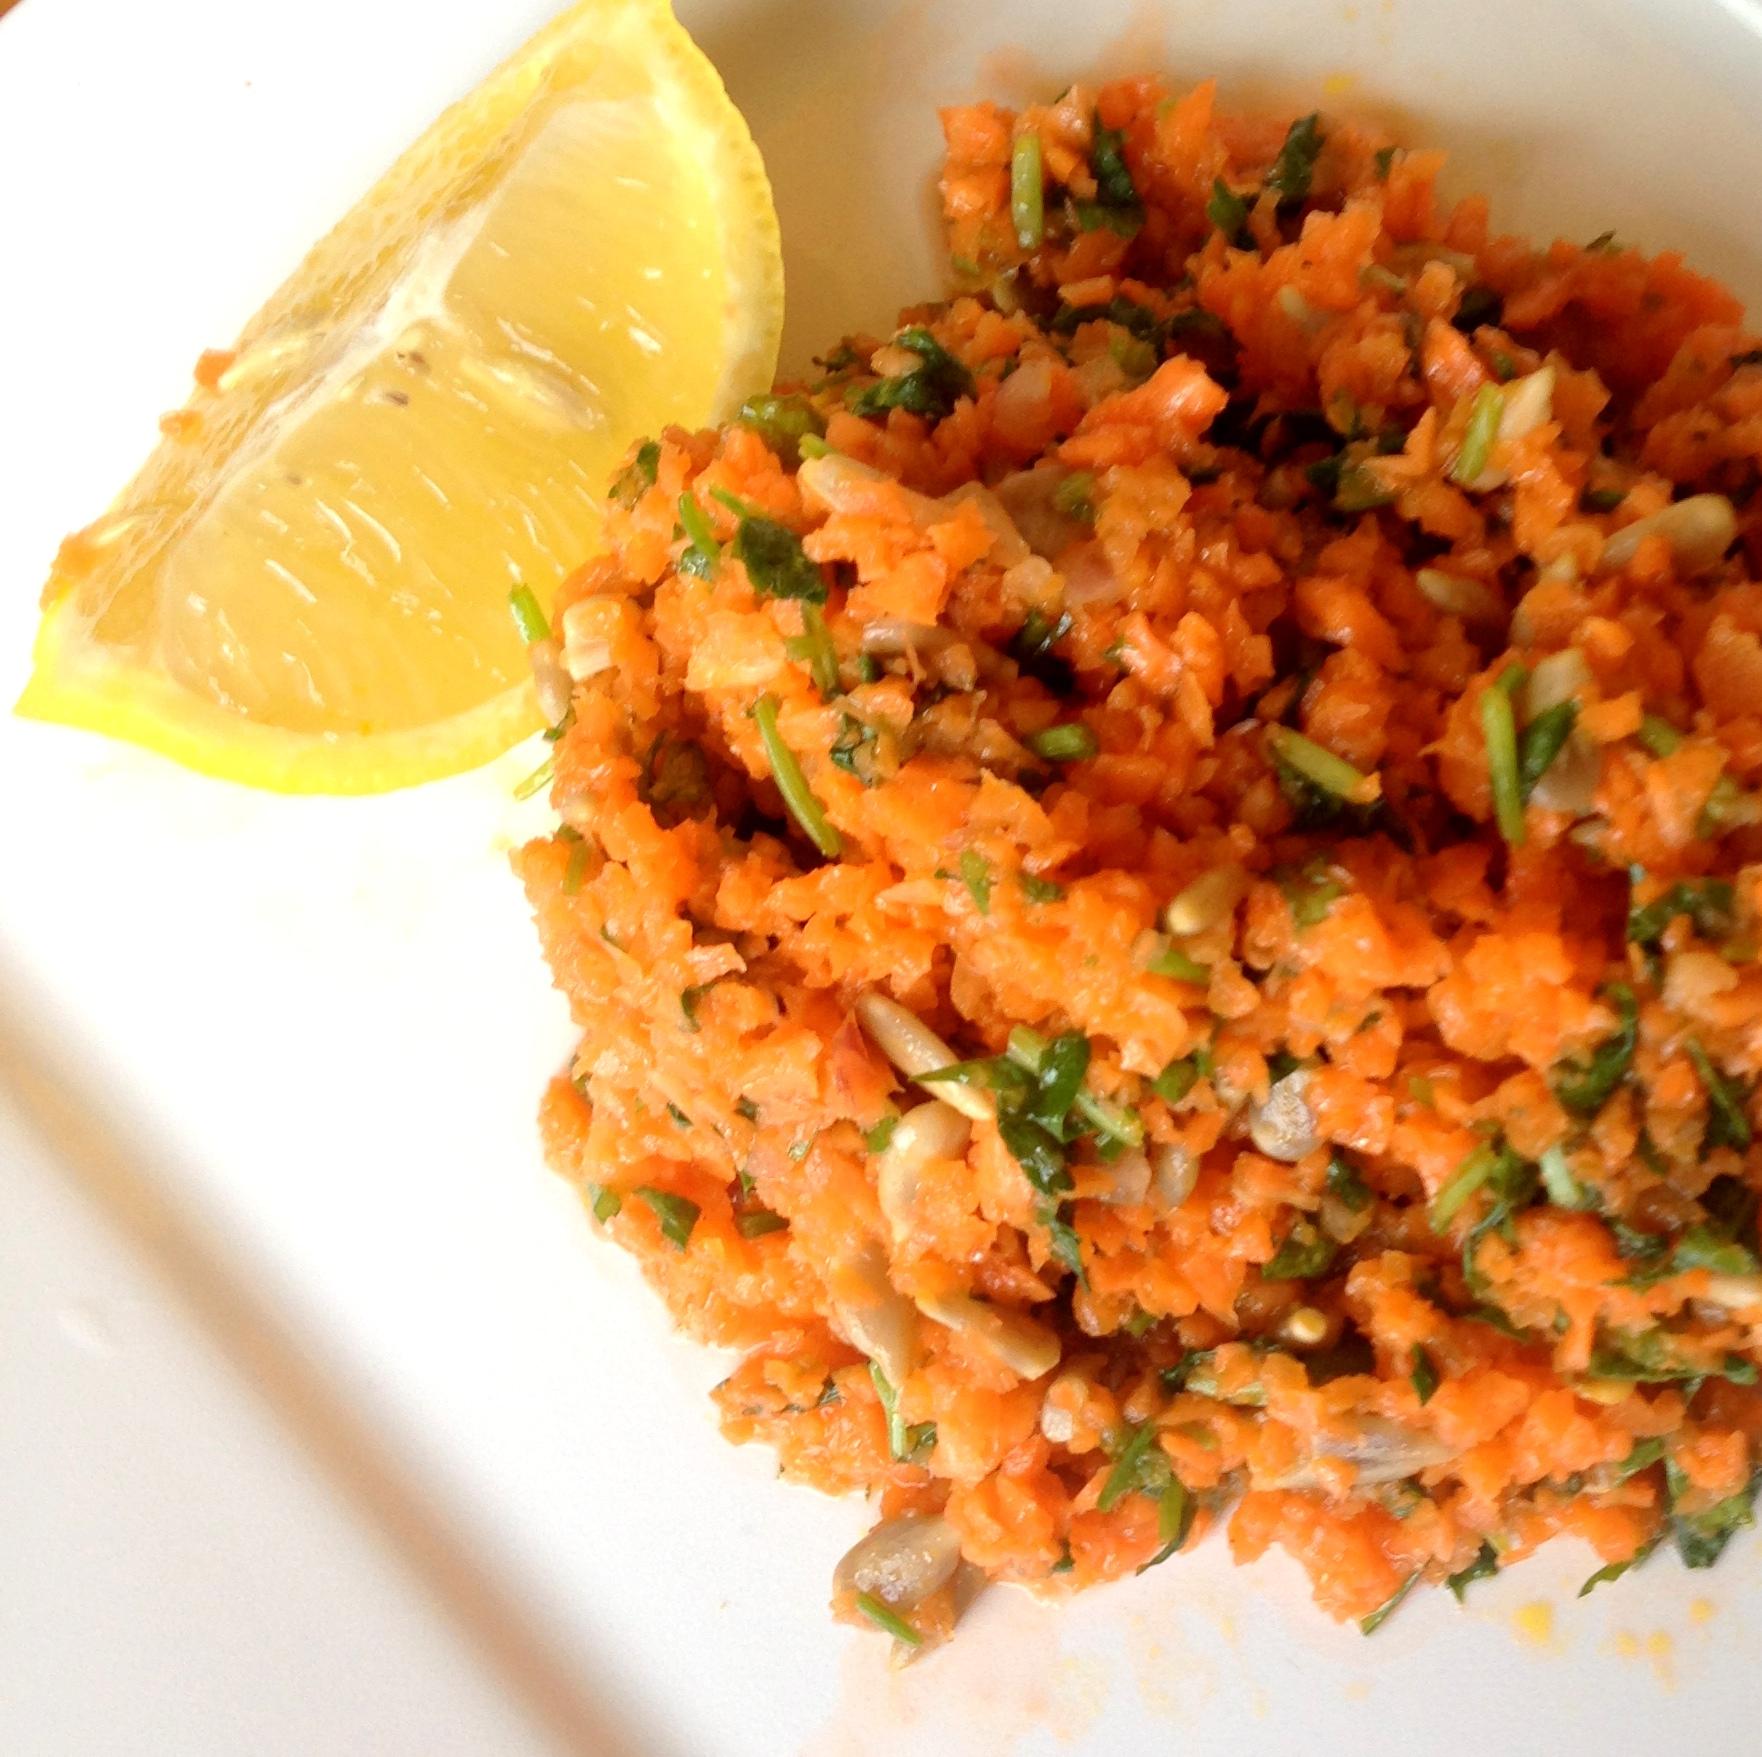 Carrot Tabbouleh Recipe - Grain-Free Mezze